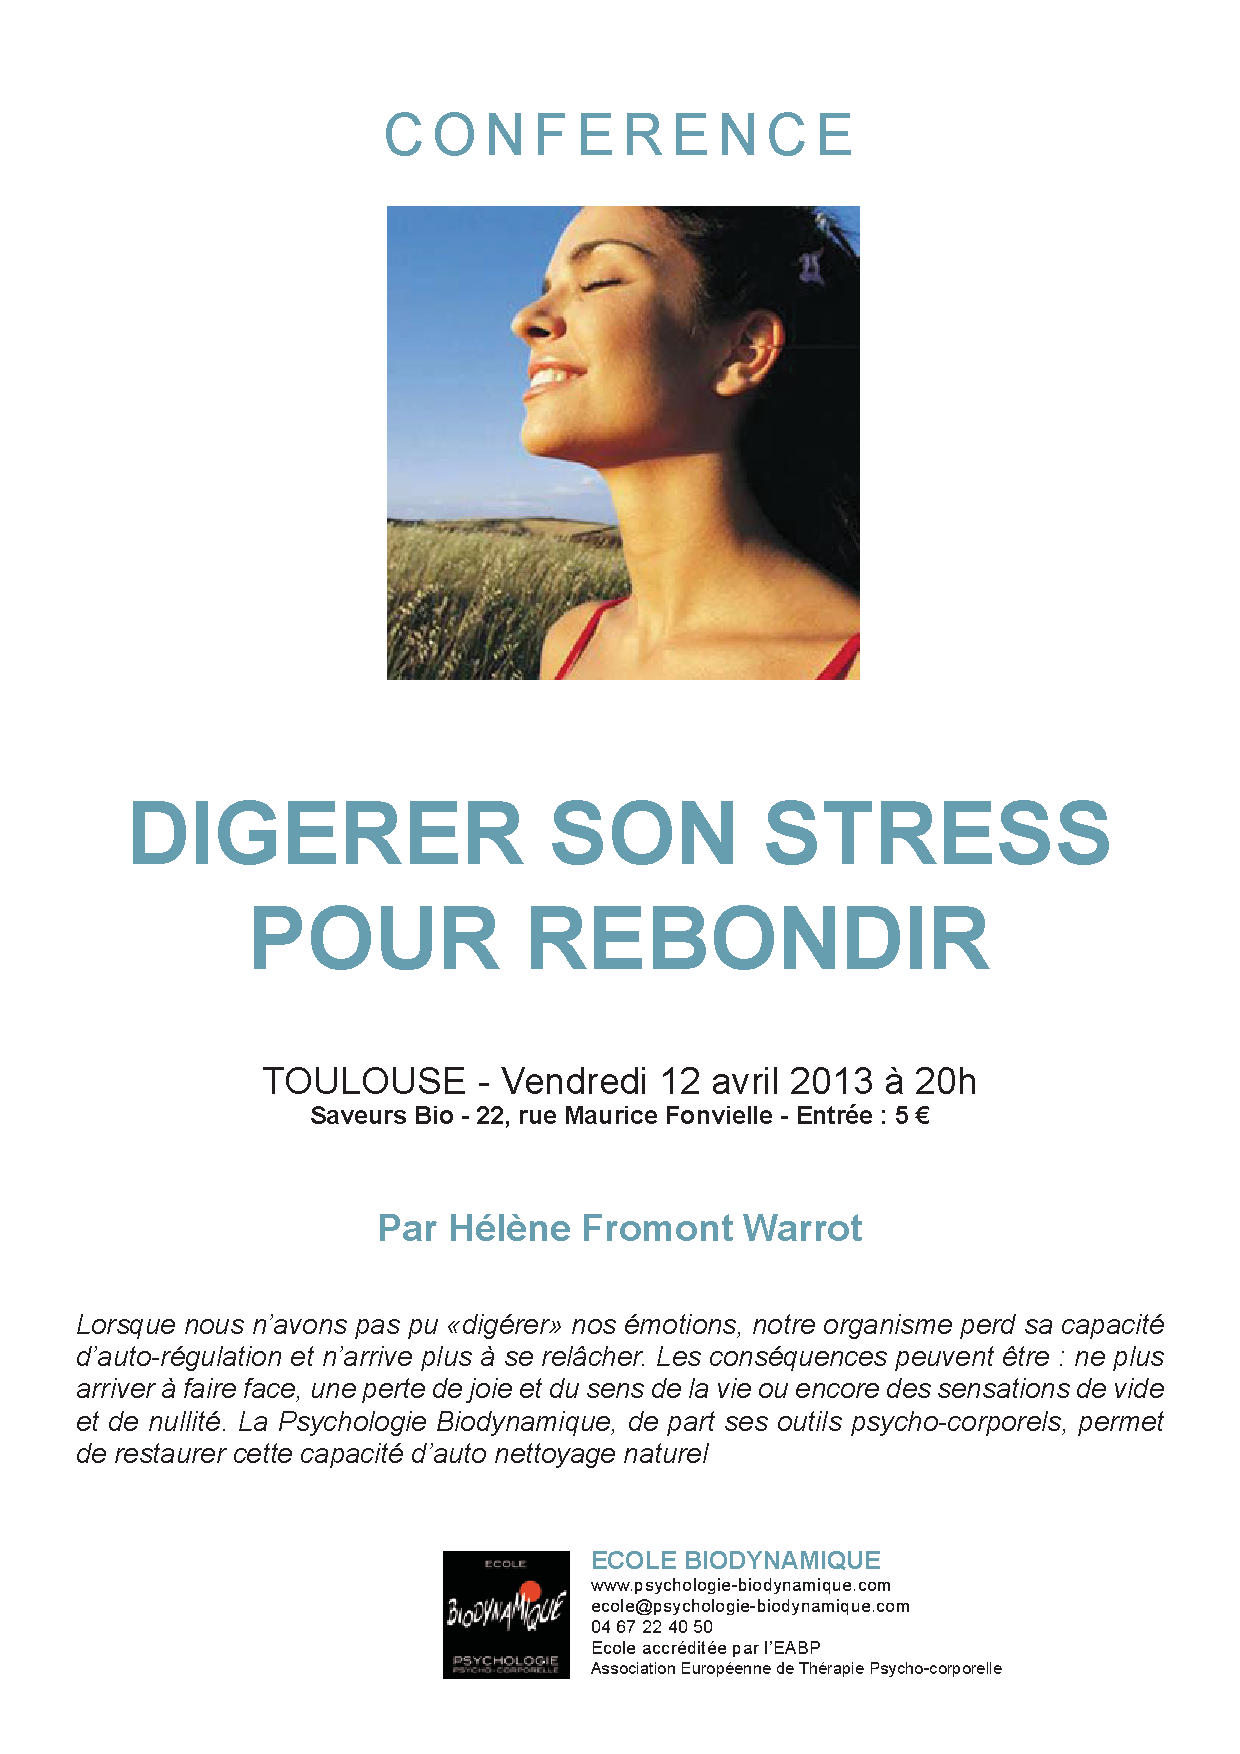 "Conférence ""Digérer son stress pour rebondir"" 12 avril 2013, Toulouse"